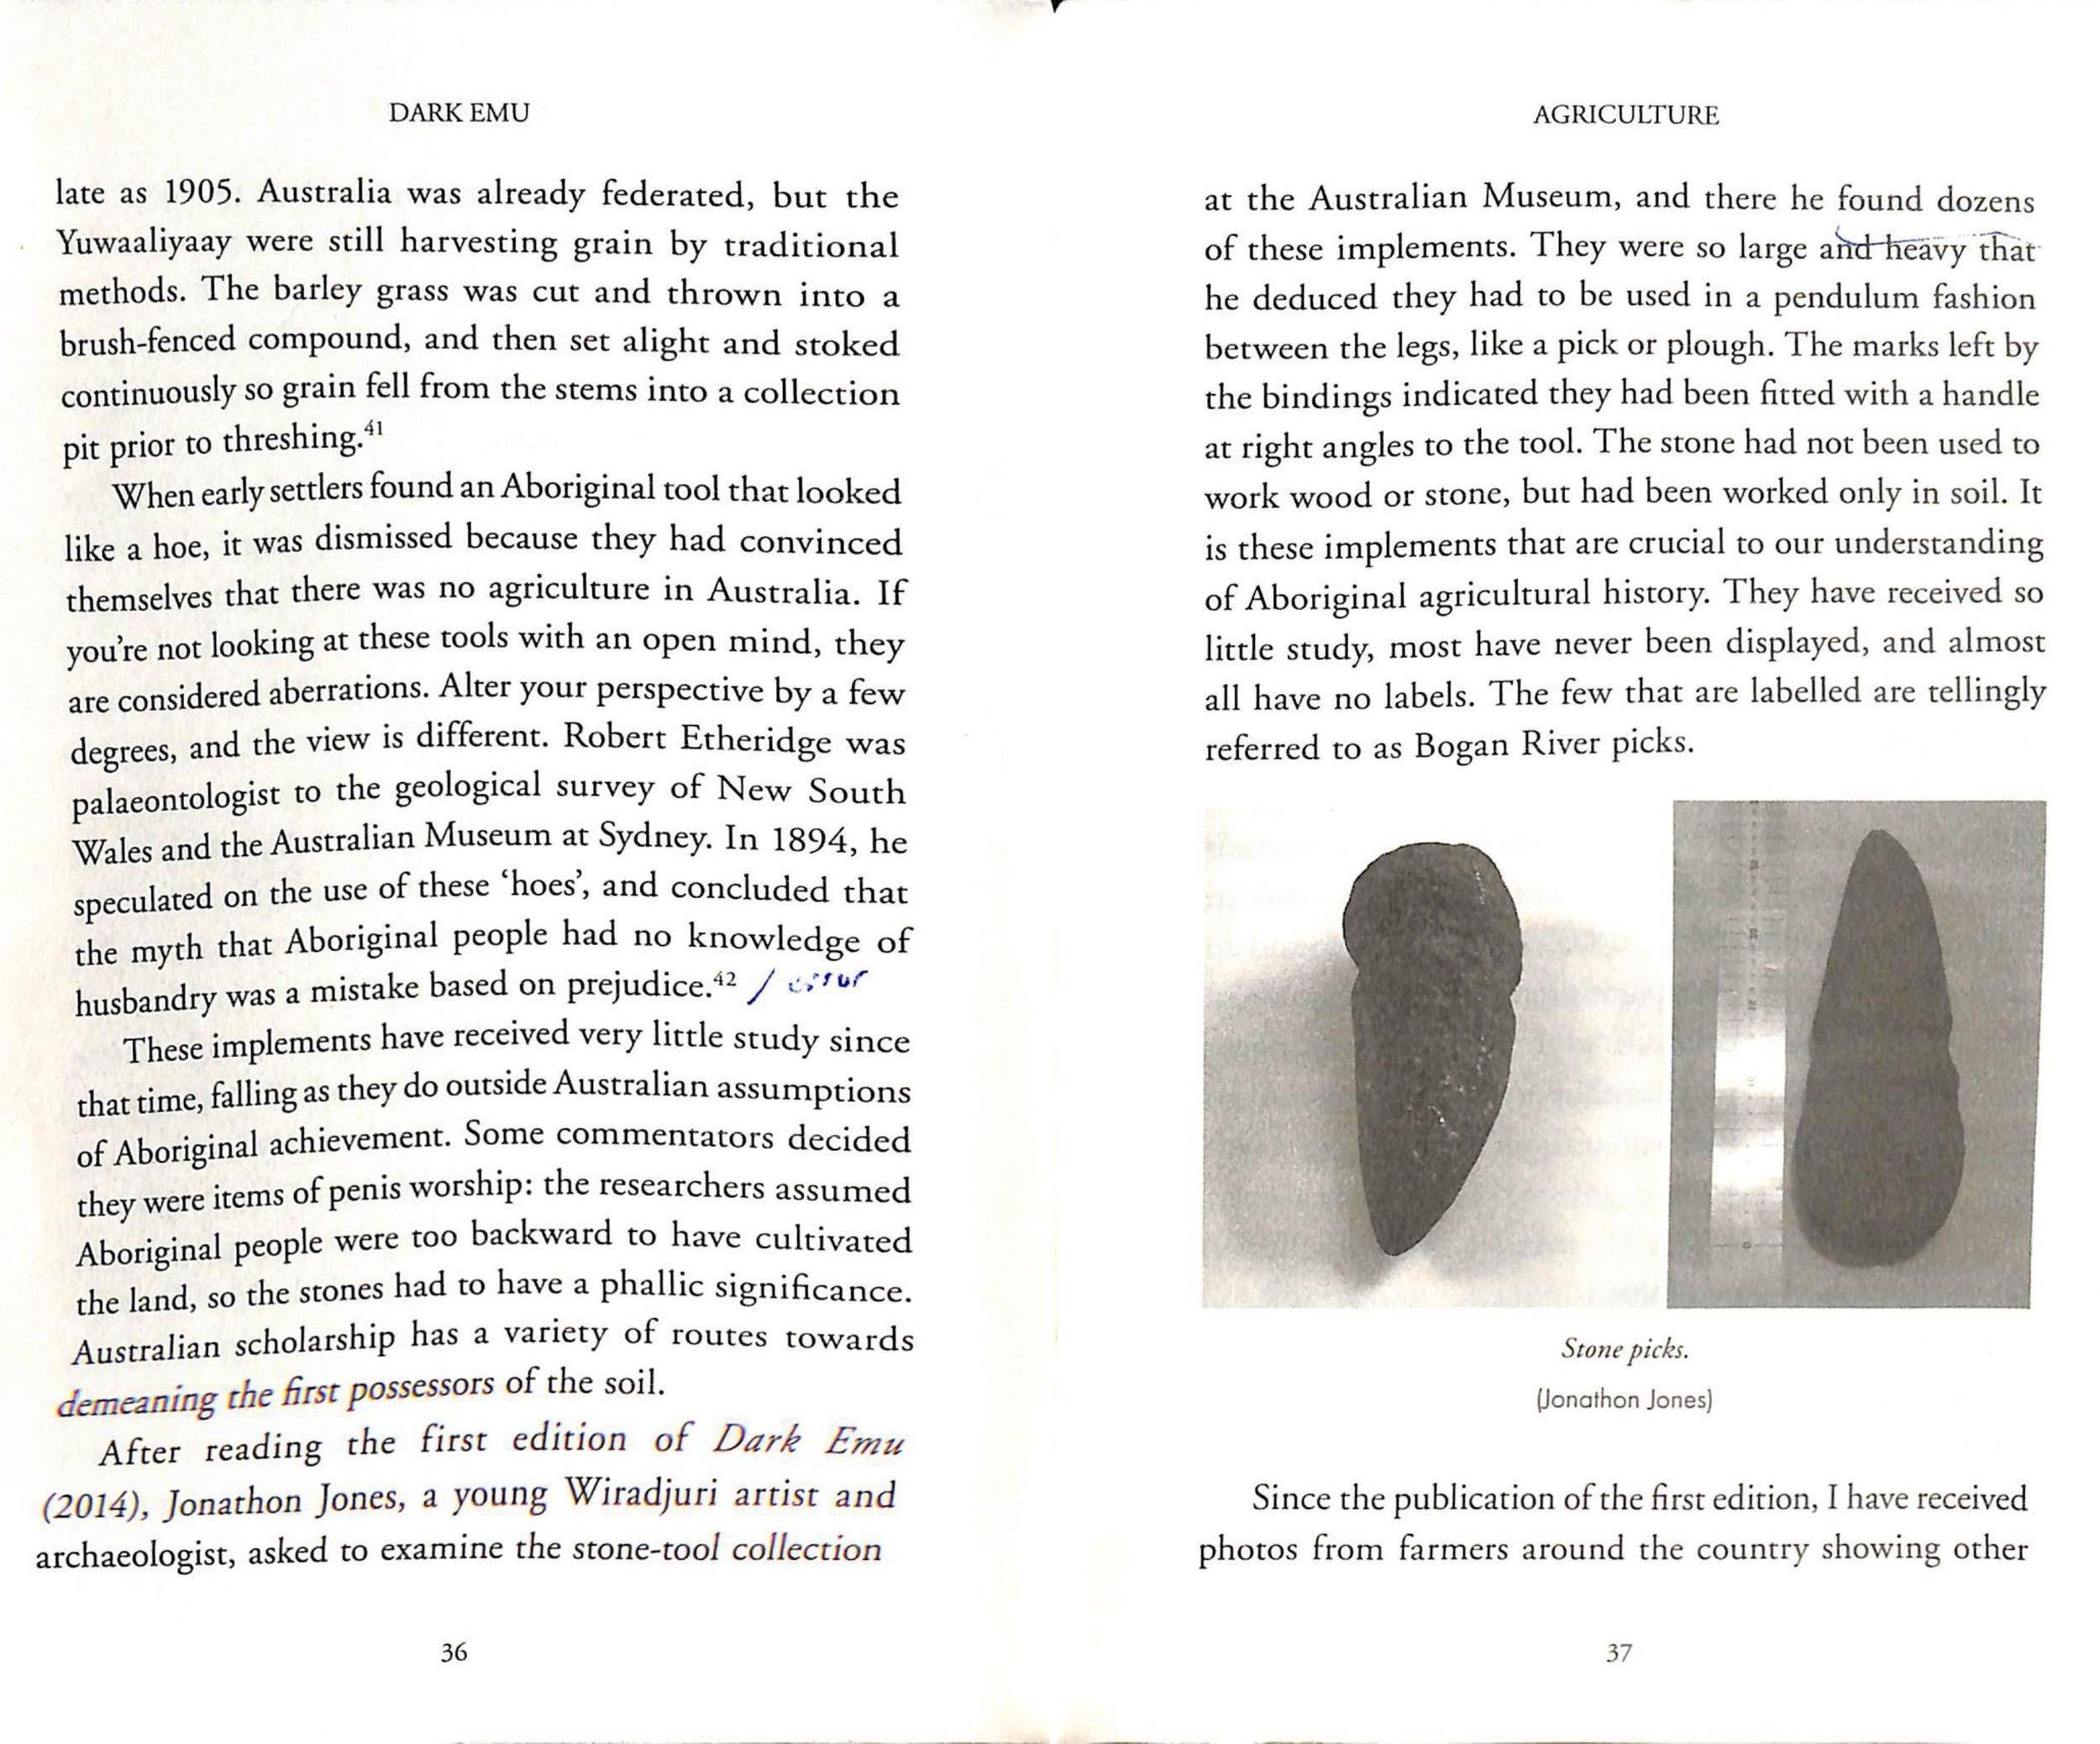 - Excerpt from Dark Emu regarding Etheridge's stone picks.